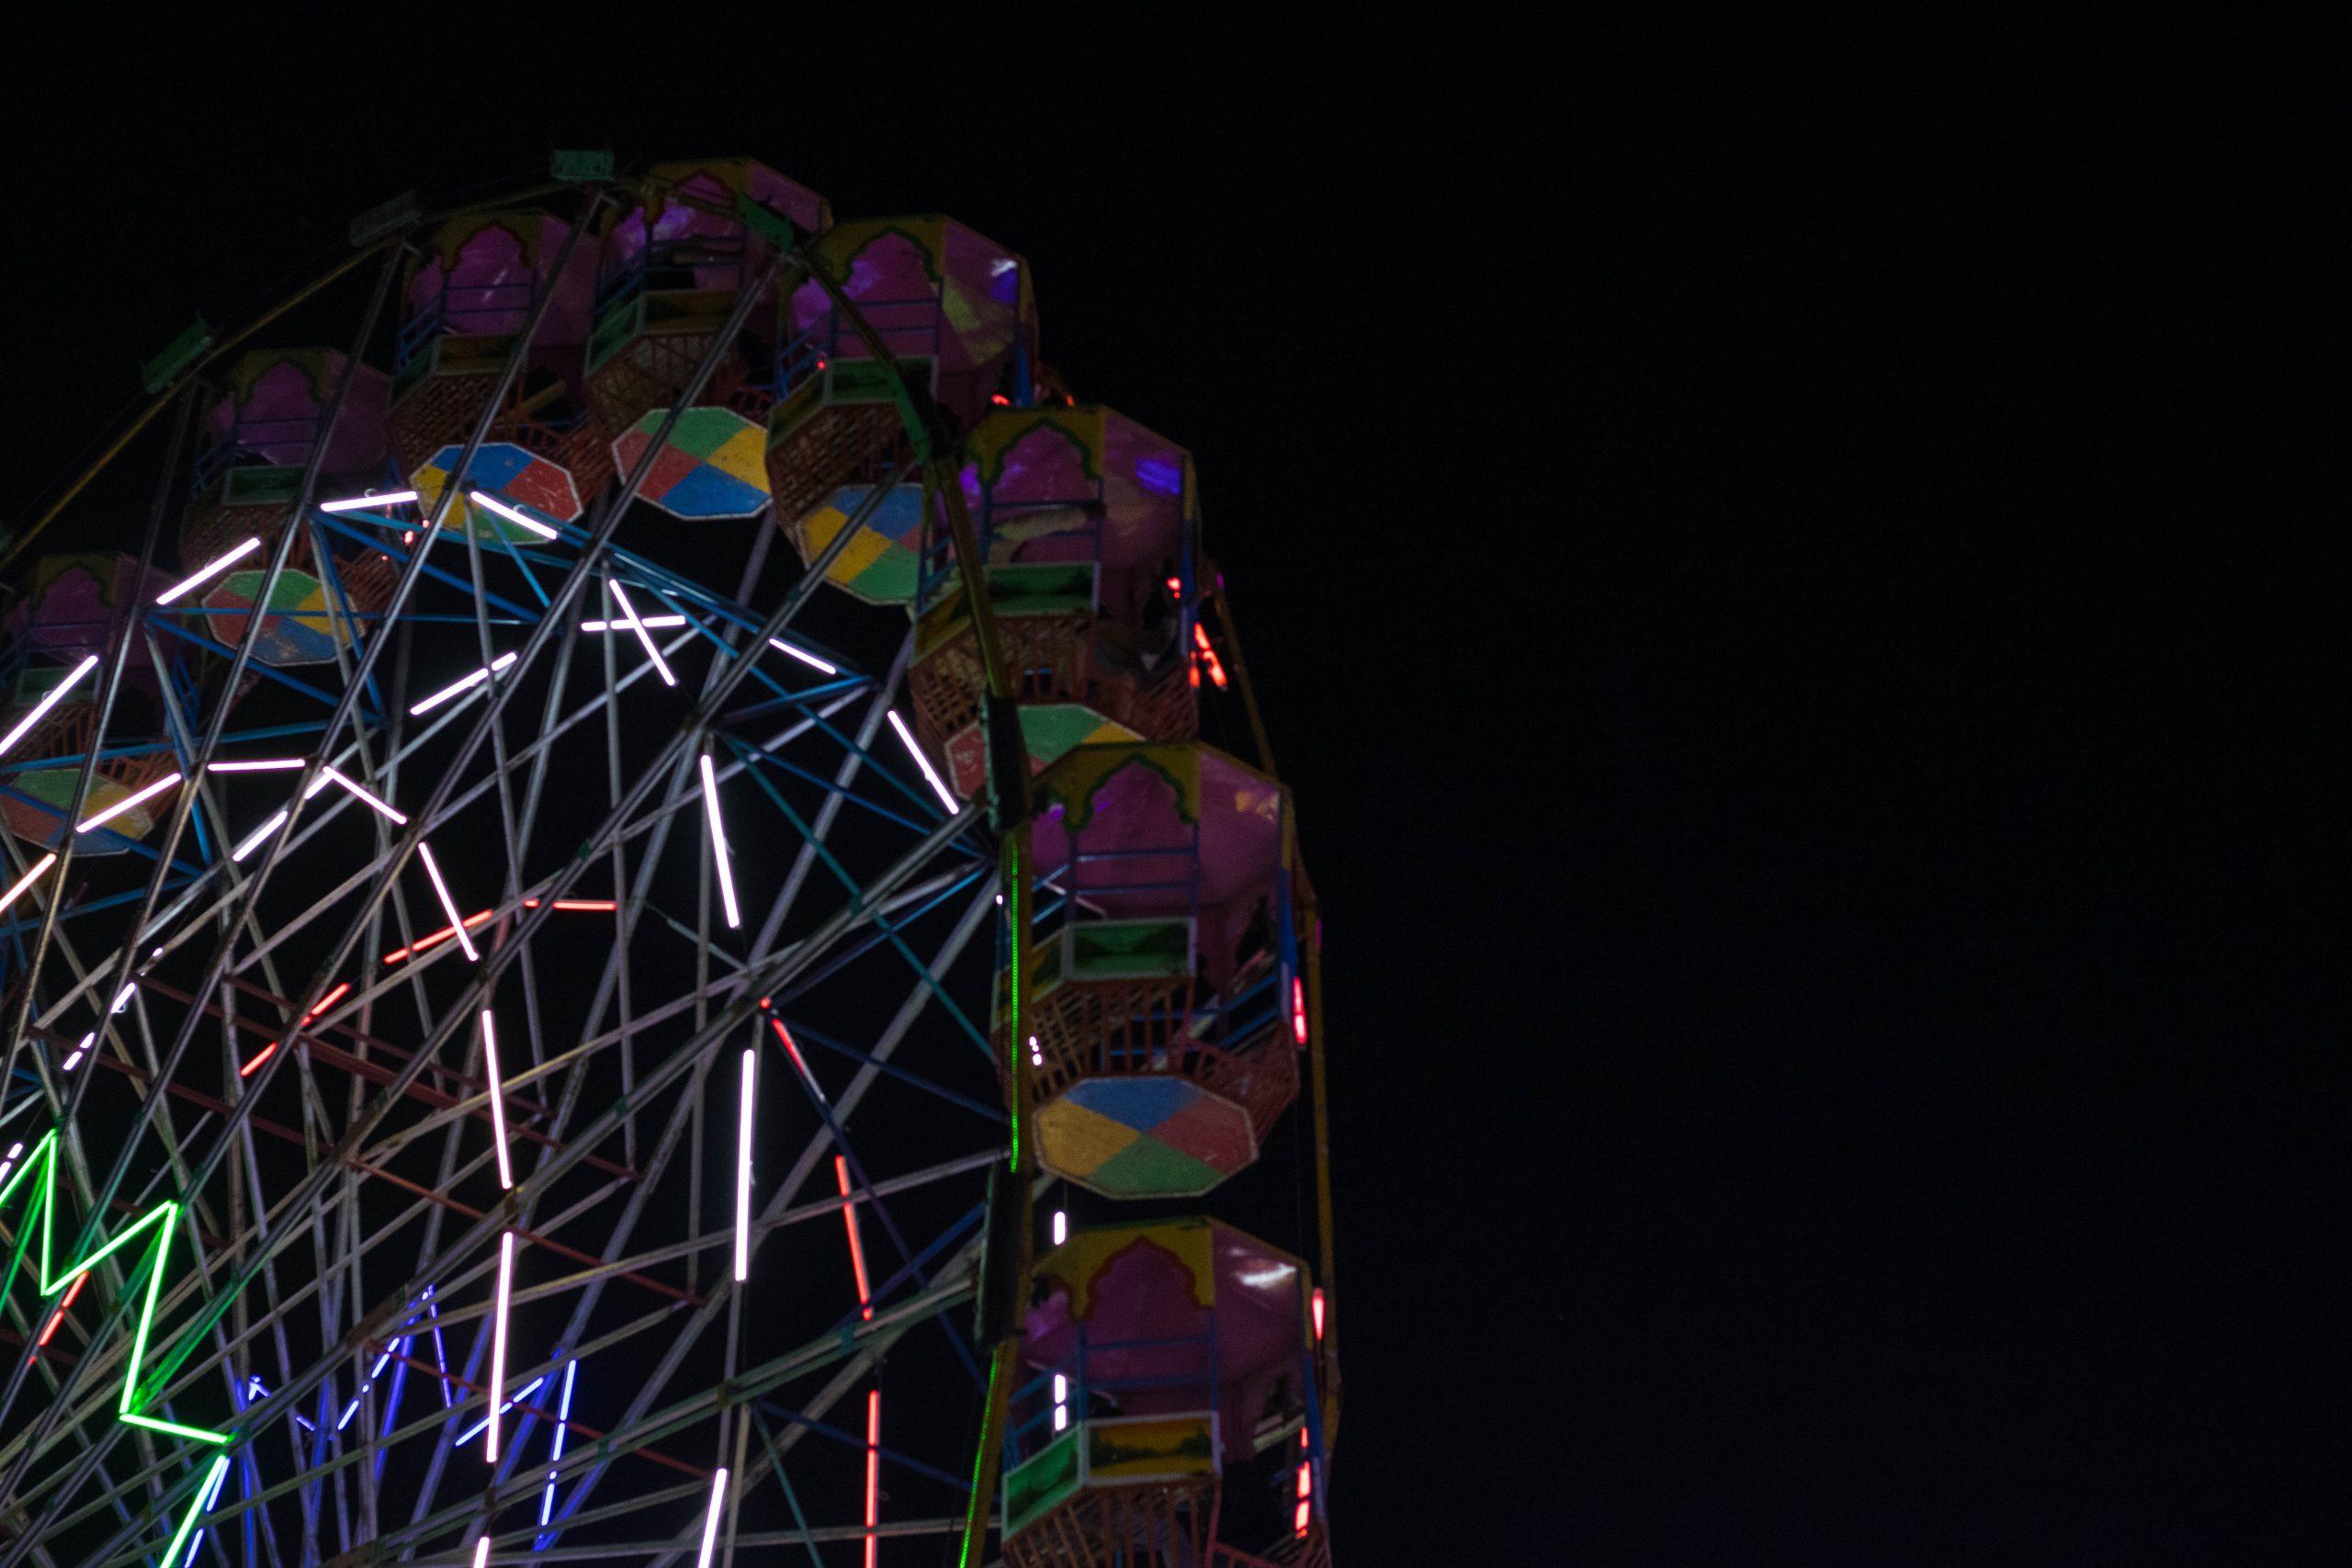 Big wheel in Pushkar Fair 2019.